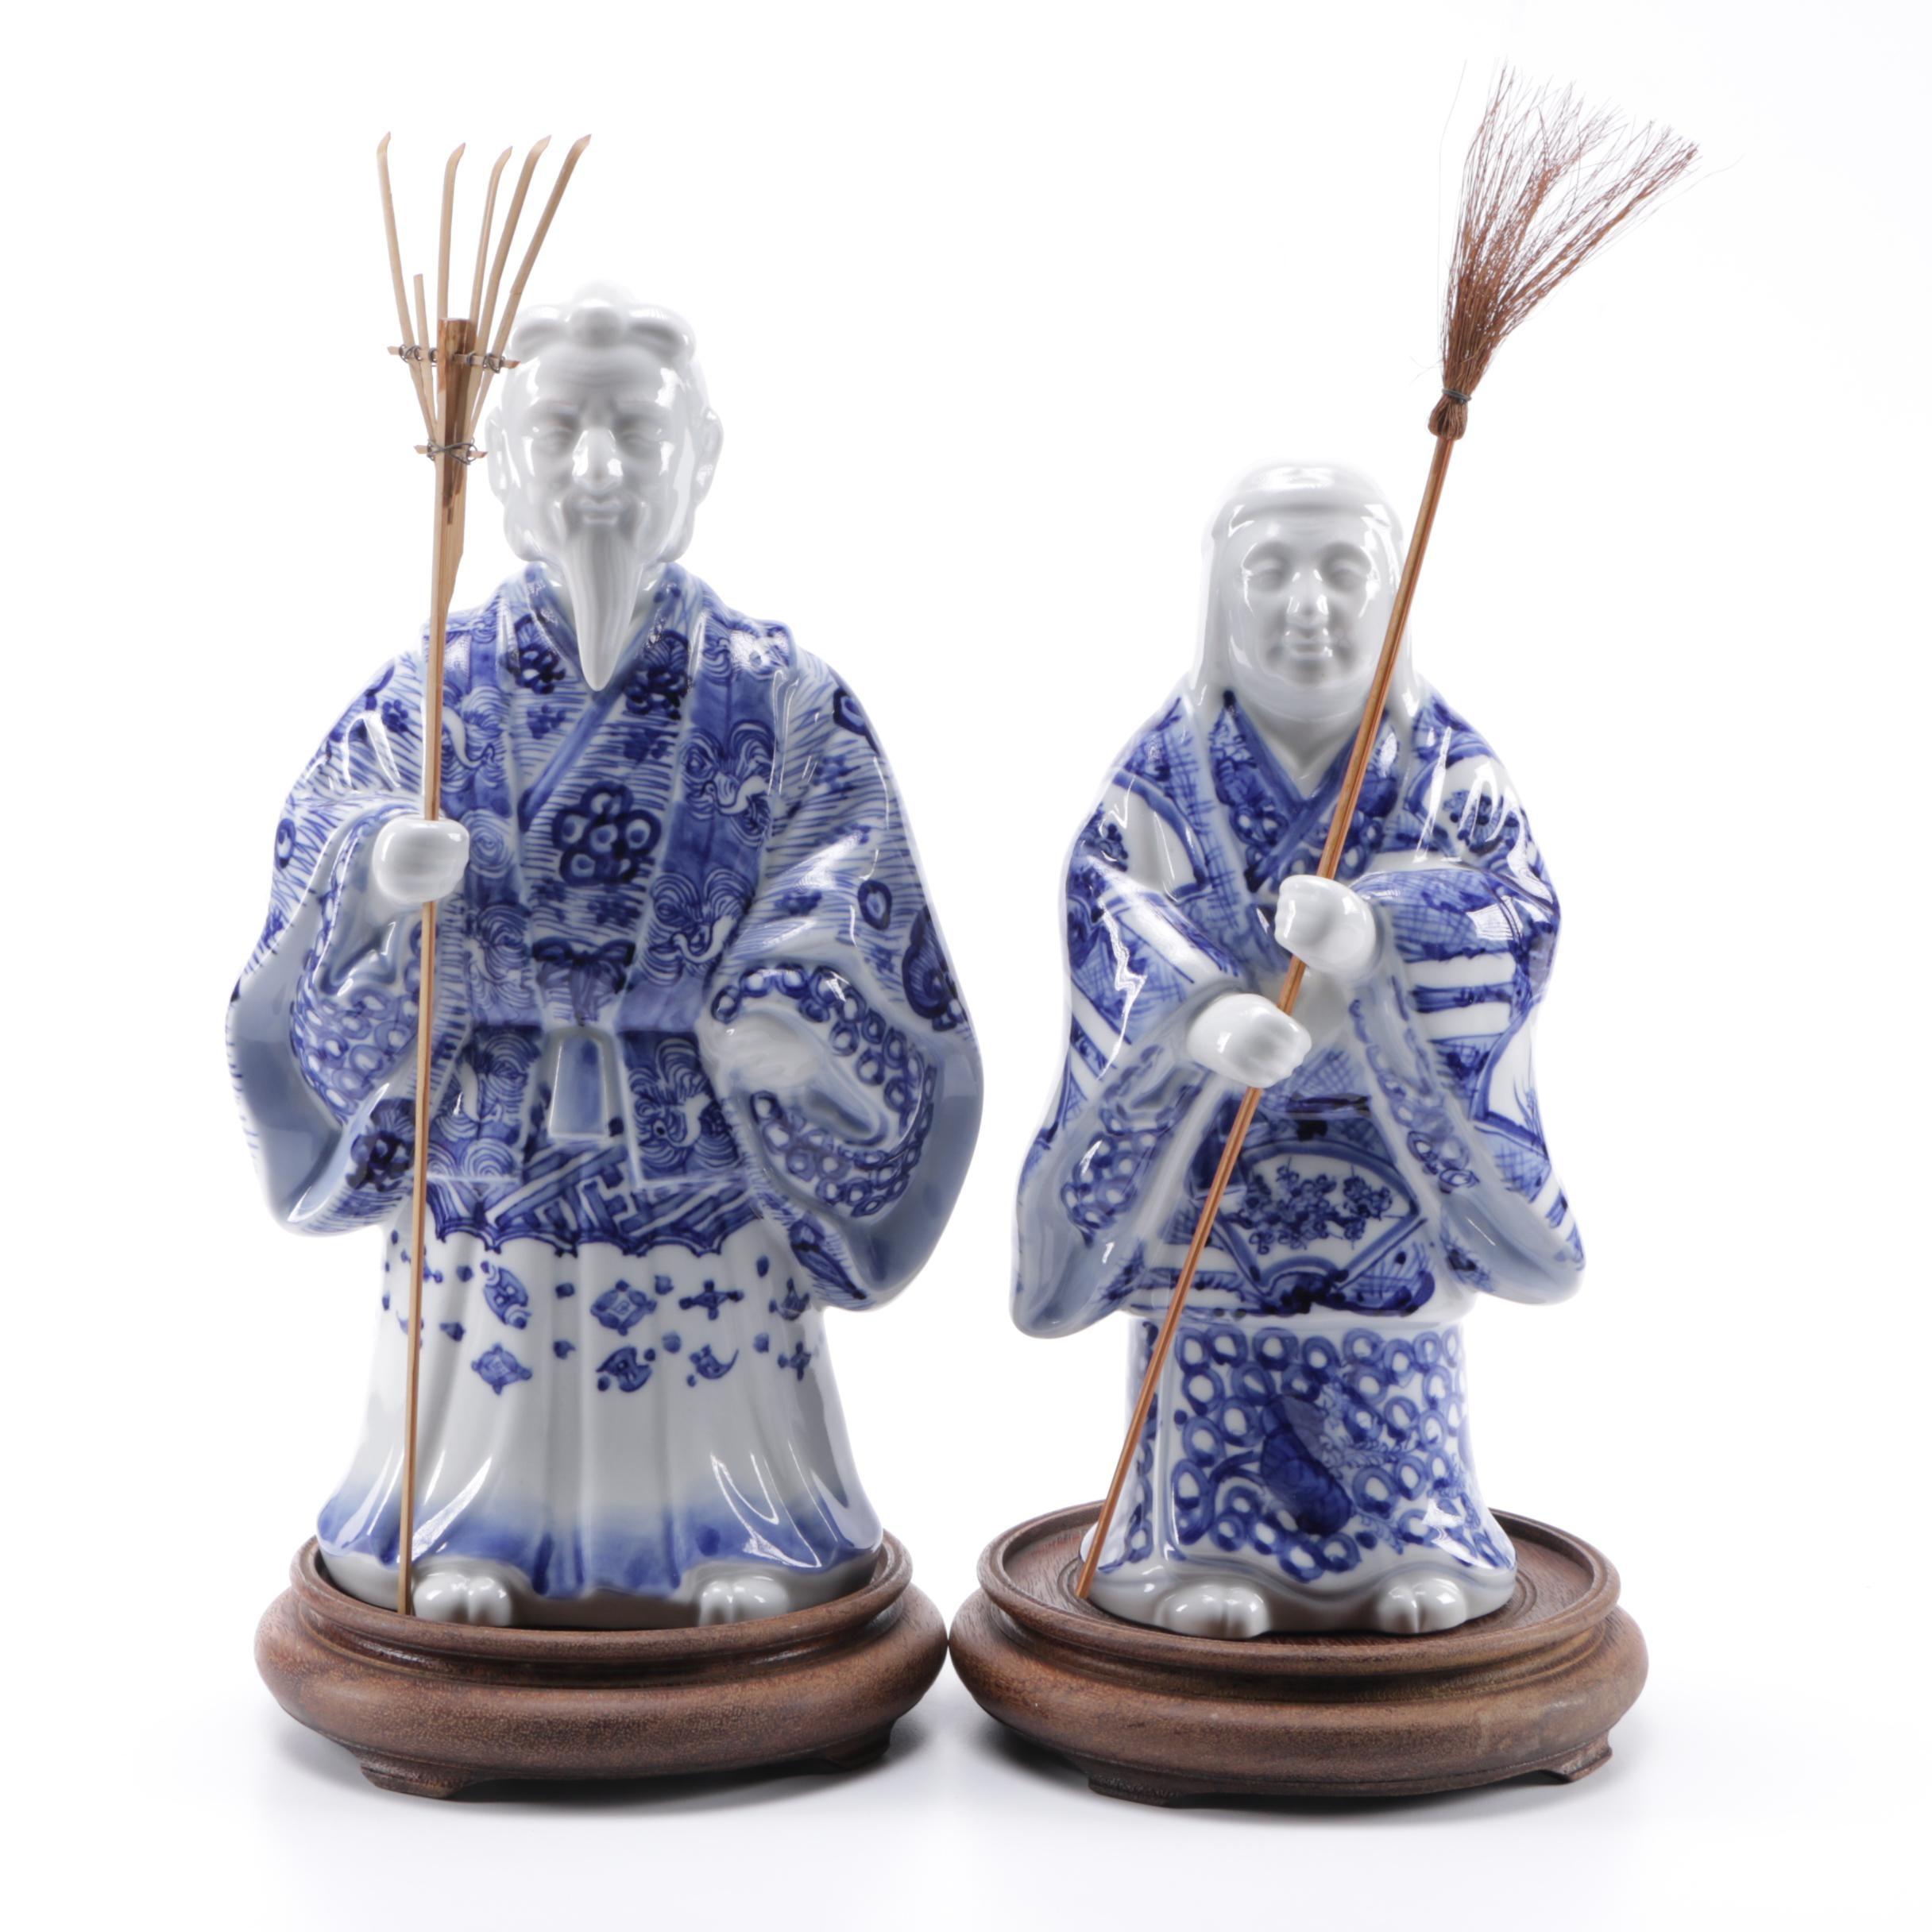 Japanese Blue and White Ceramic Figurines